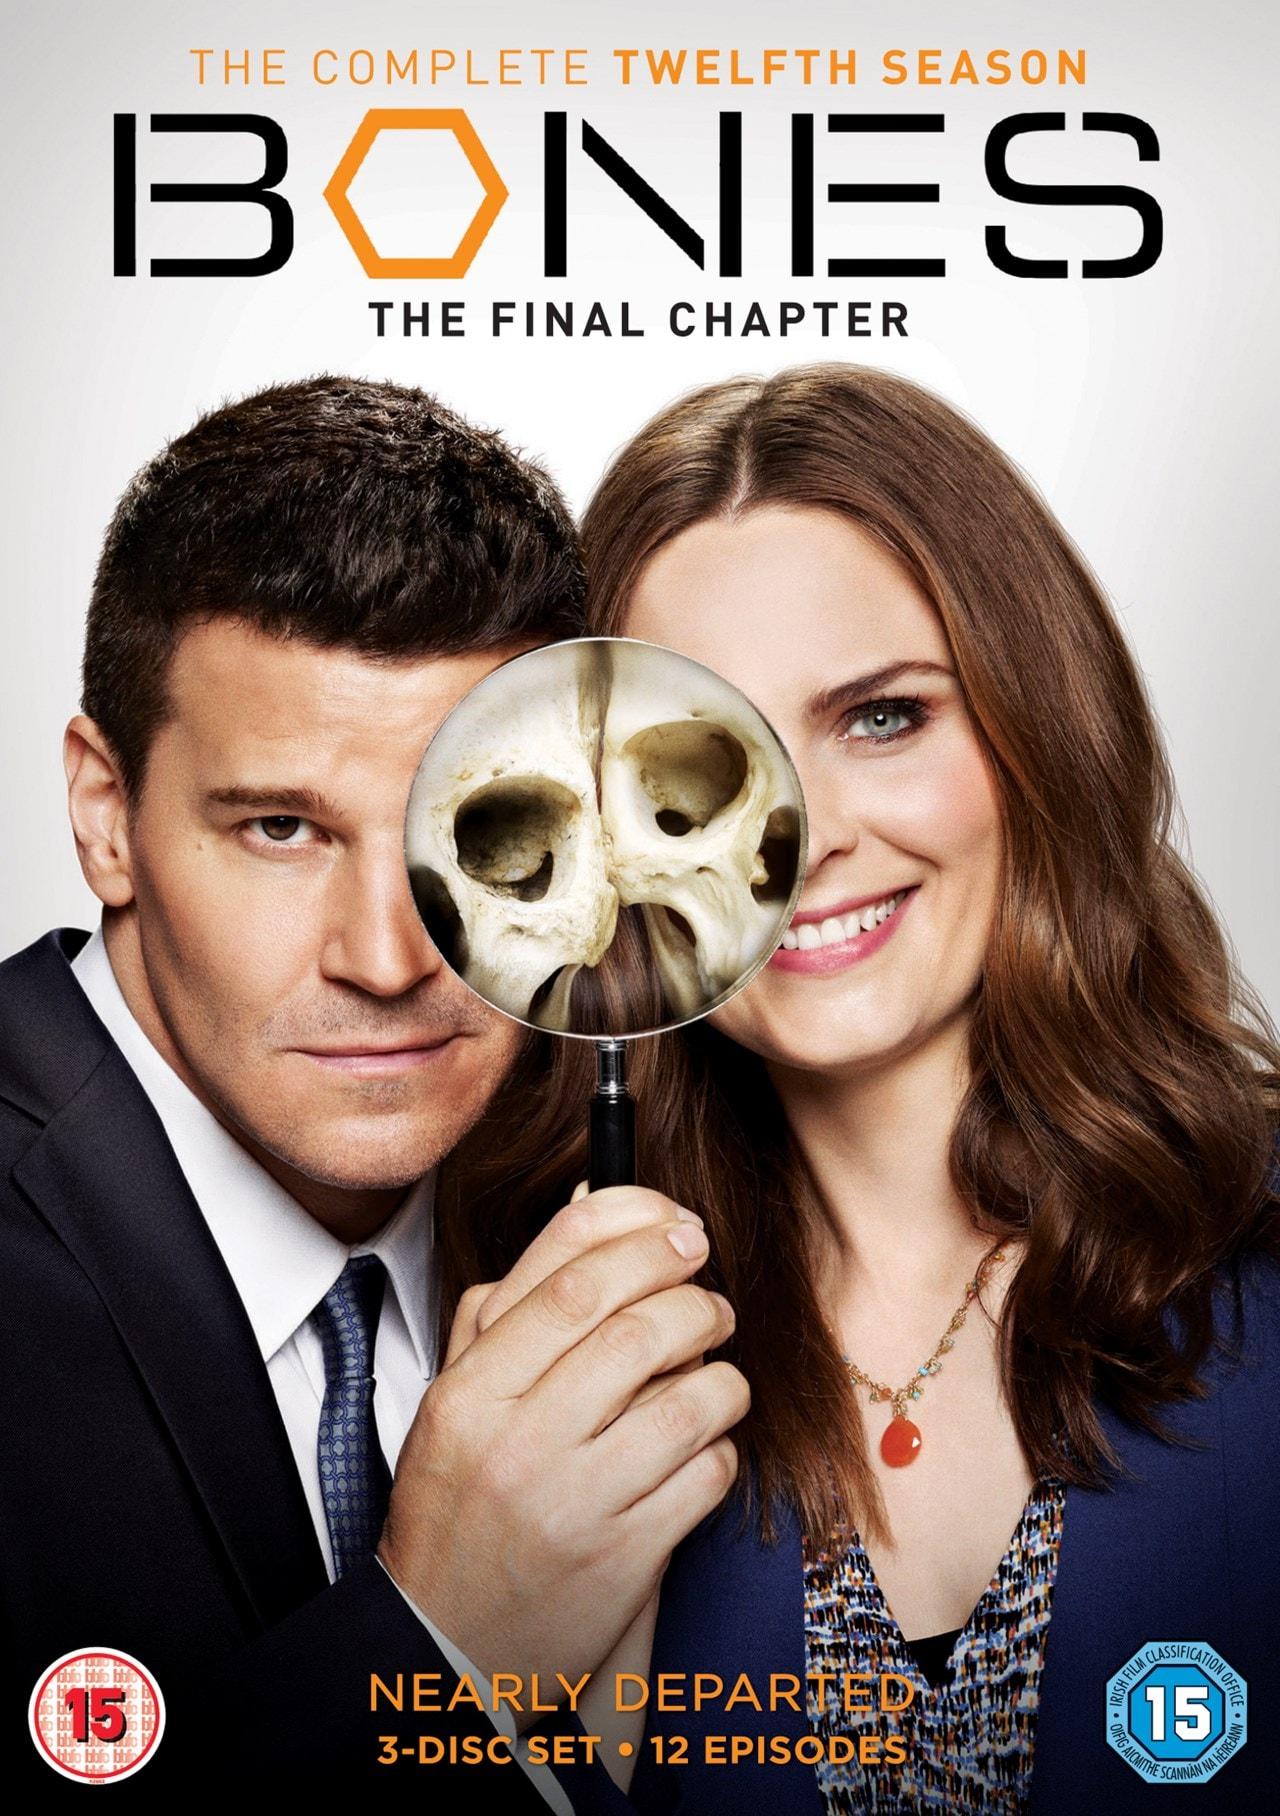 Bones: The Complete Twelfth Season - The Final Chapter - 1